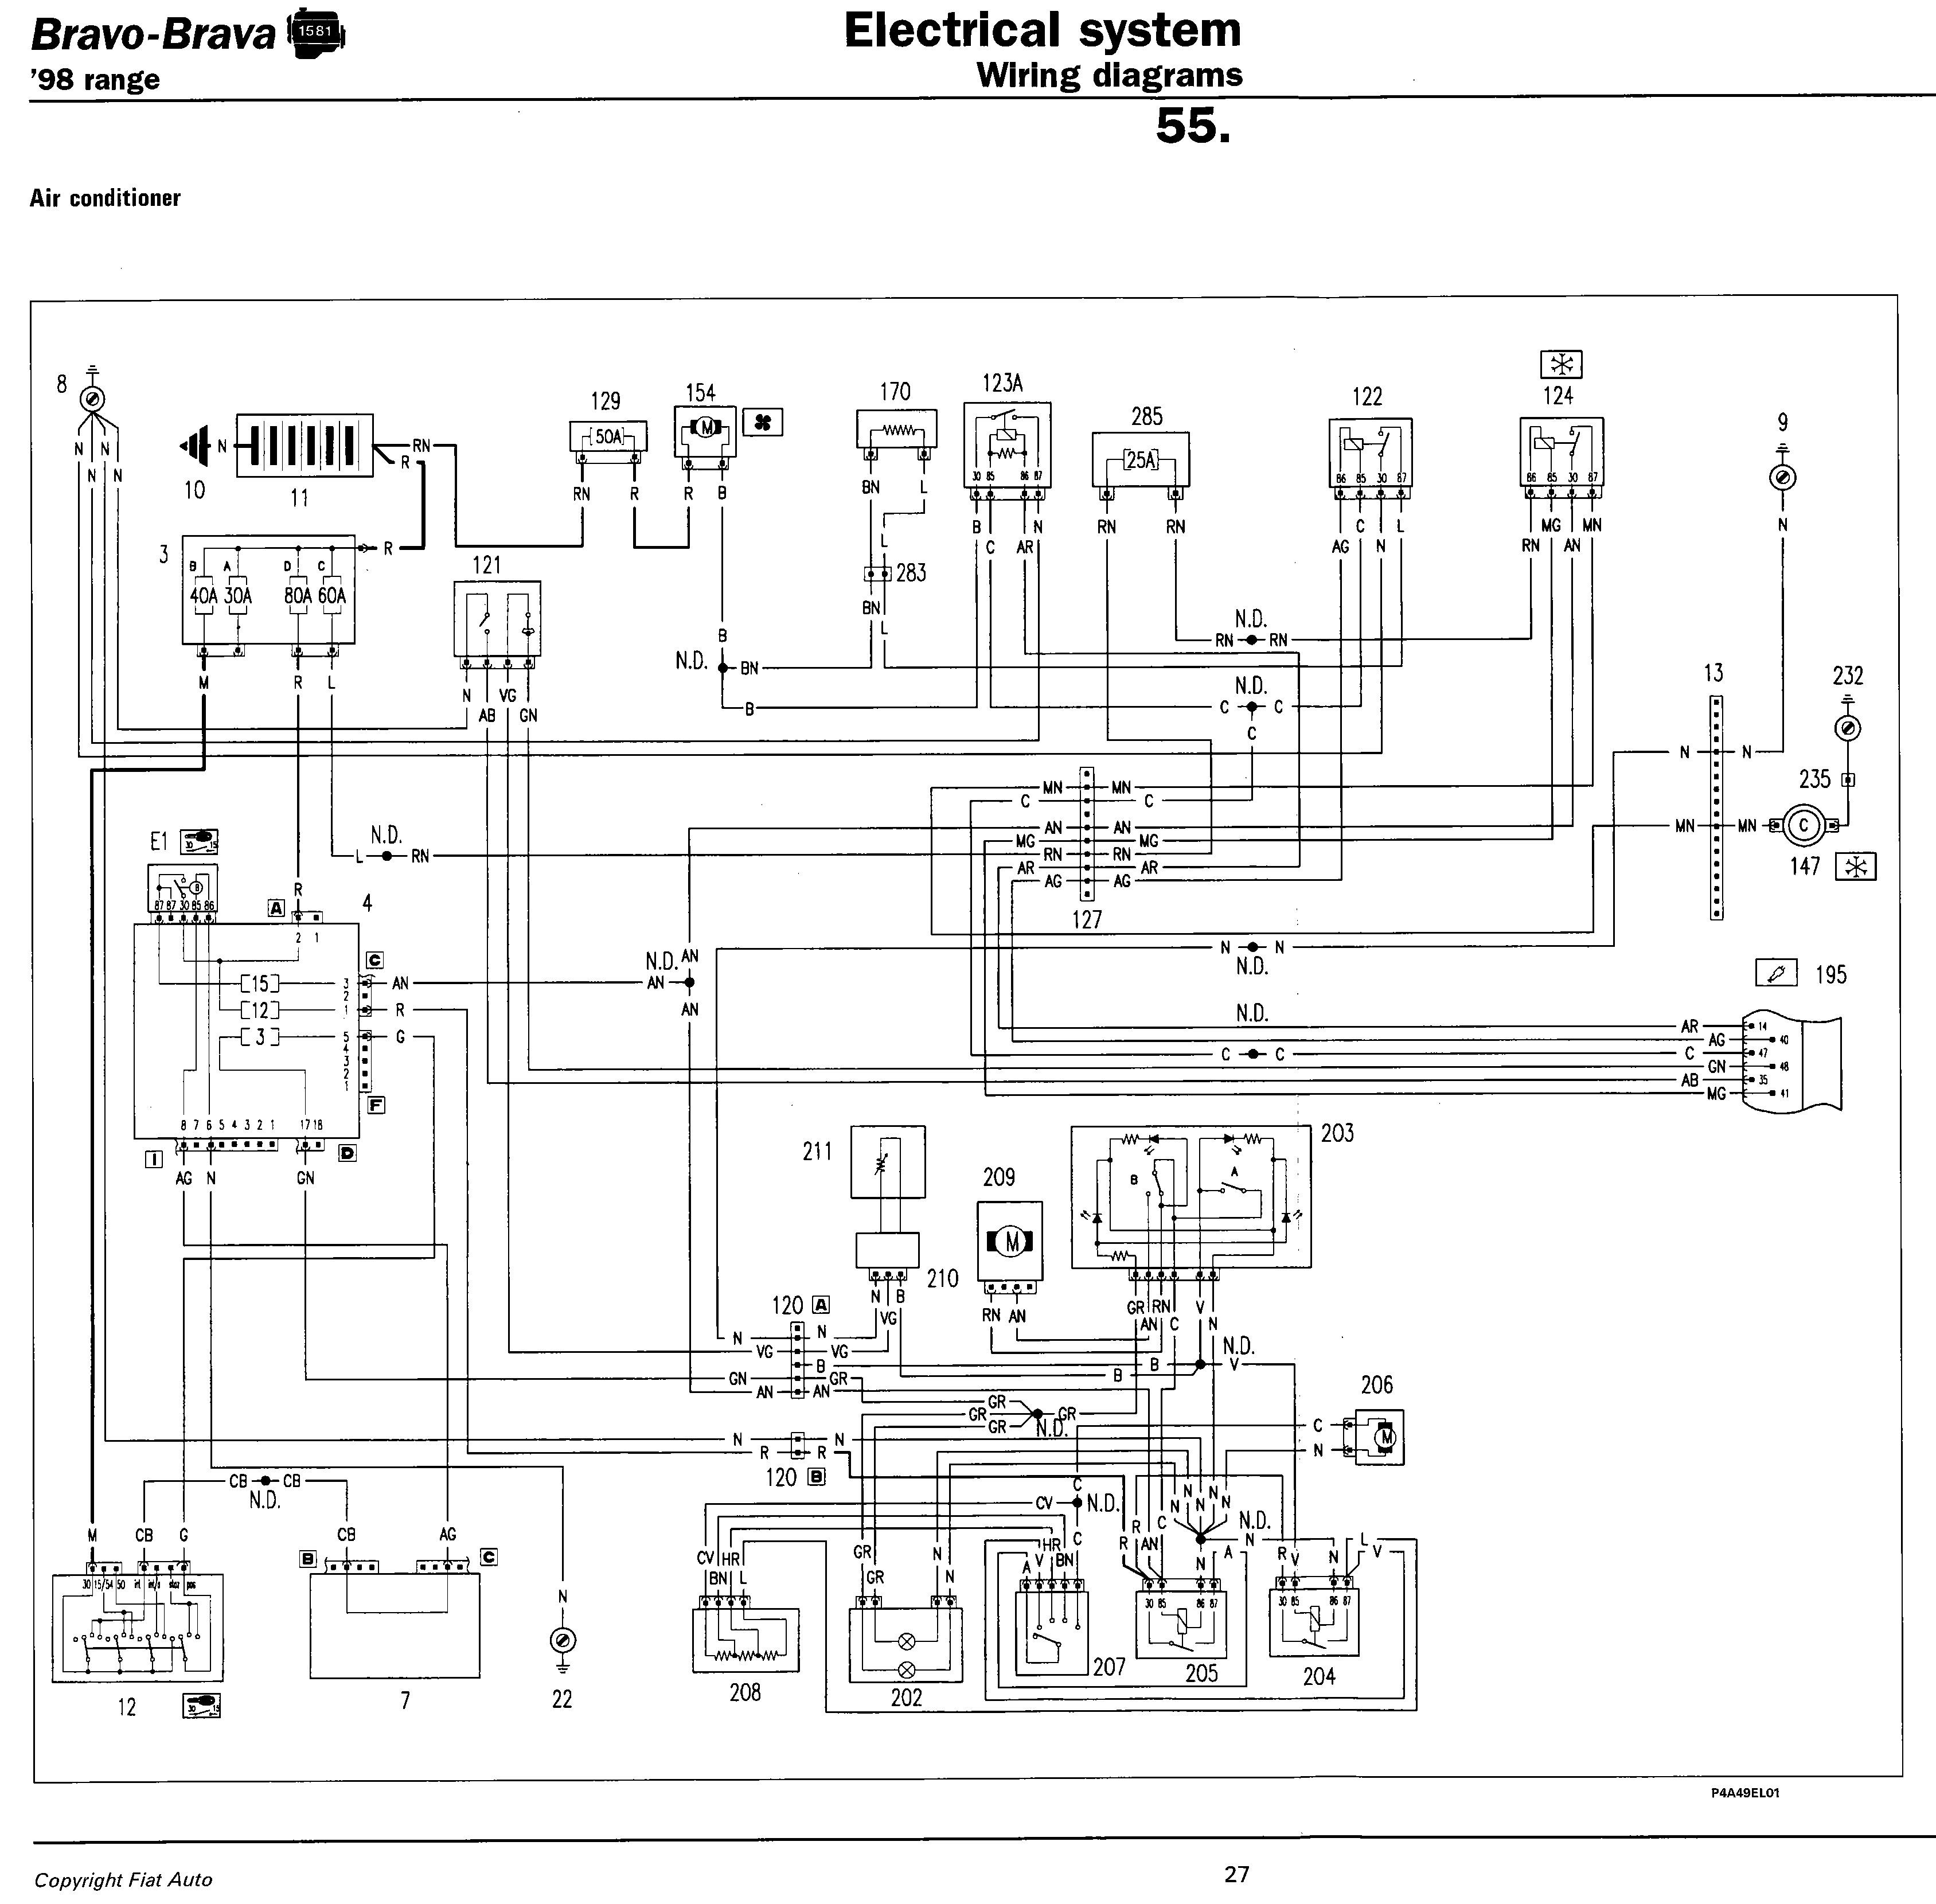 kawasaki 1100 stx jet ski wiring diagram wiring library kawasaki zrx 1100  specs kawasaki 1100 stx